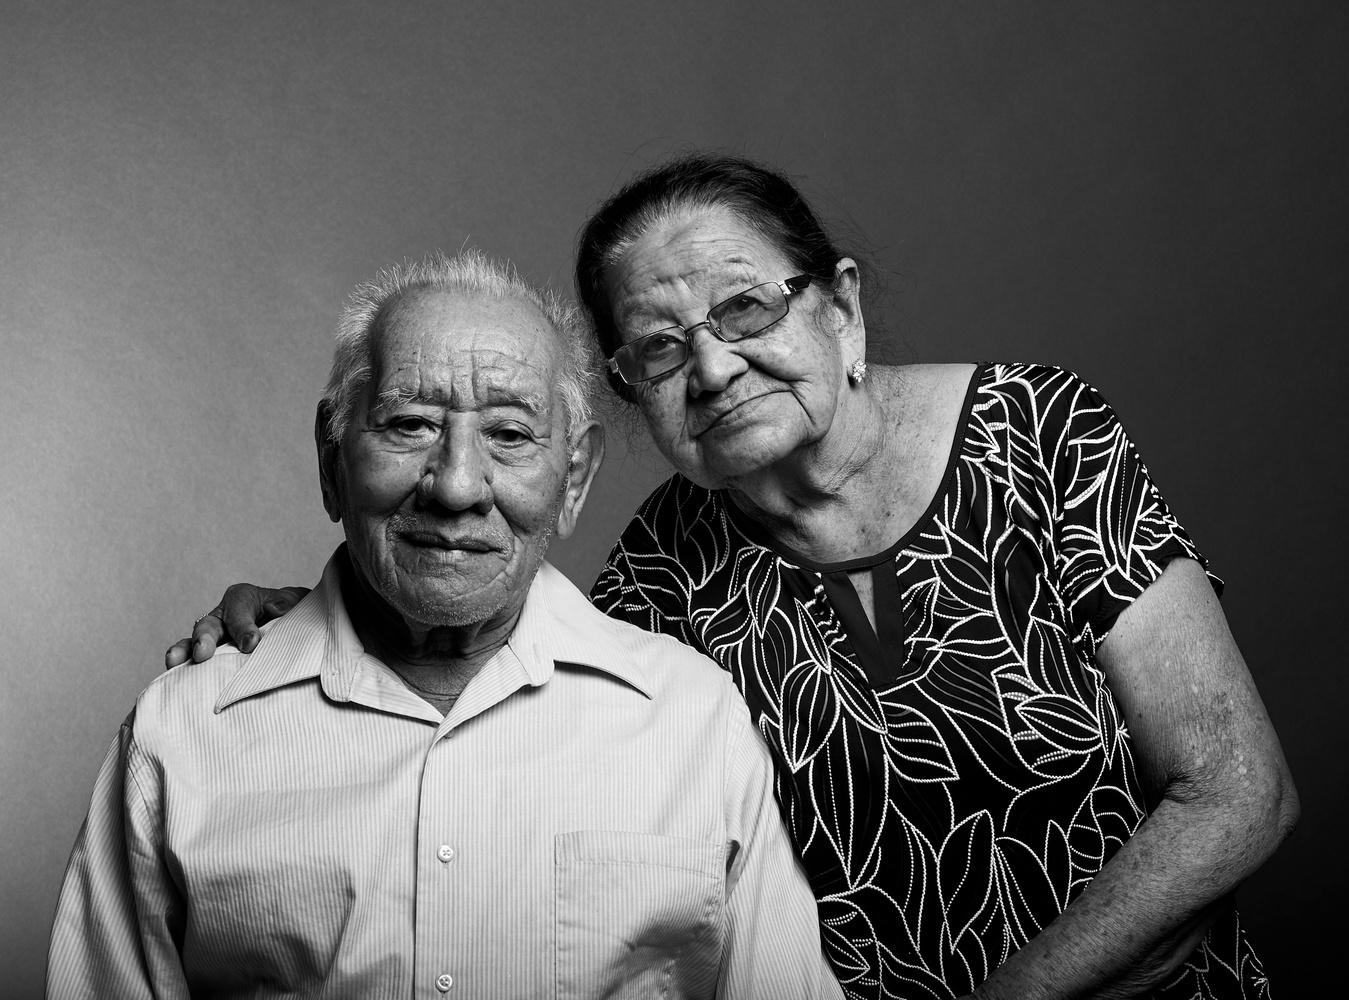 adalberto's parents by Armando Perez